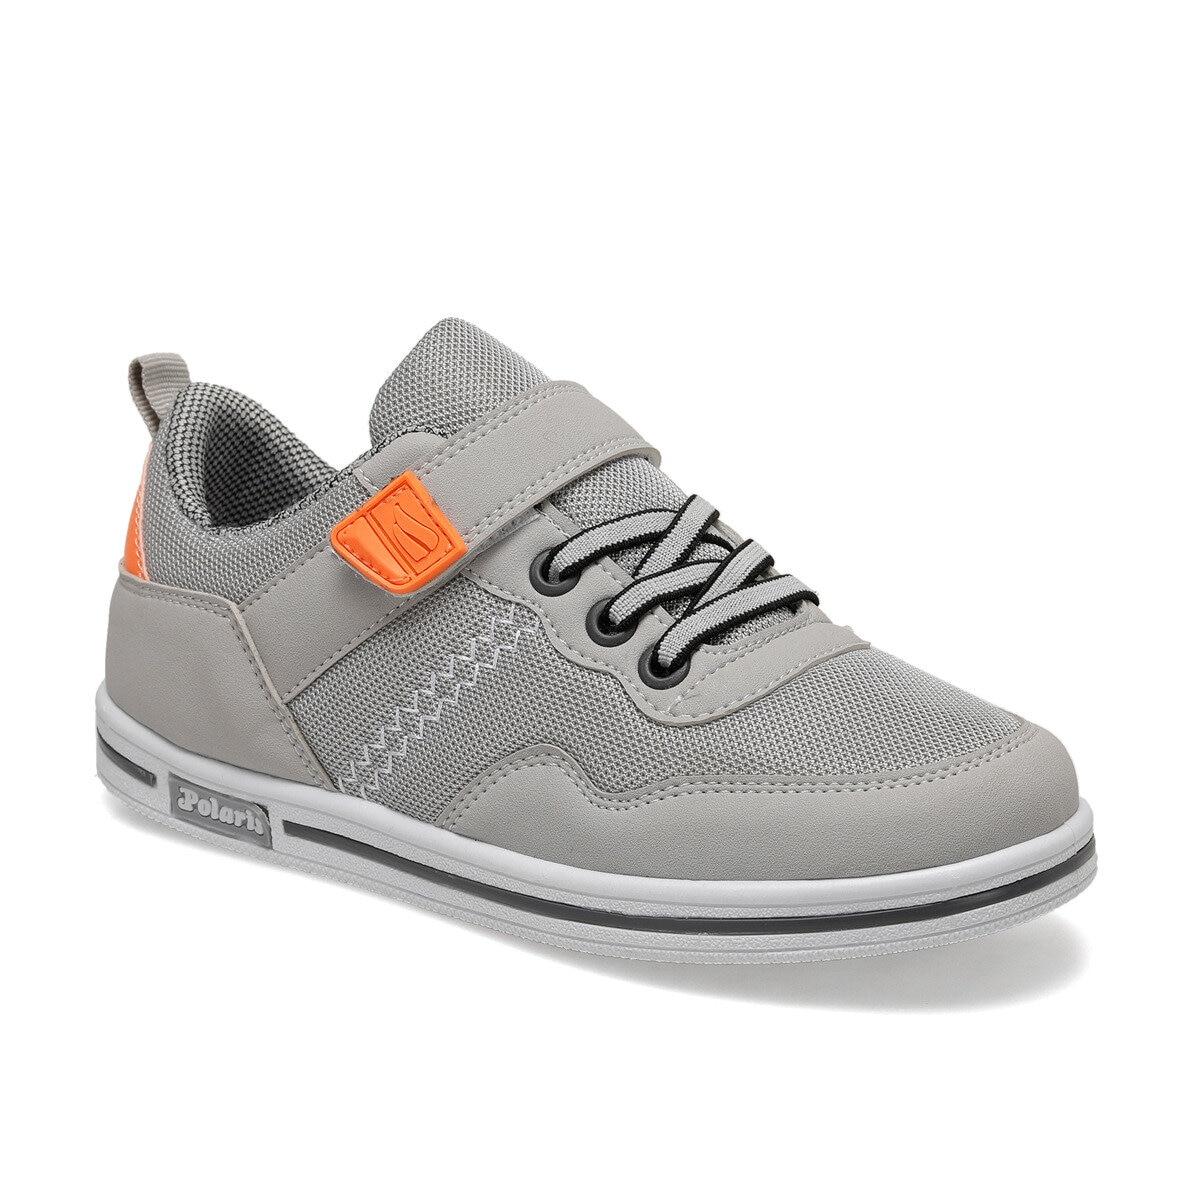 FLO 512532.F Gray Male Child Sneaker Shoes Polaris